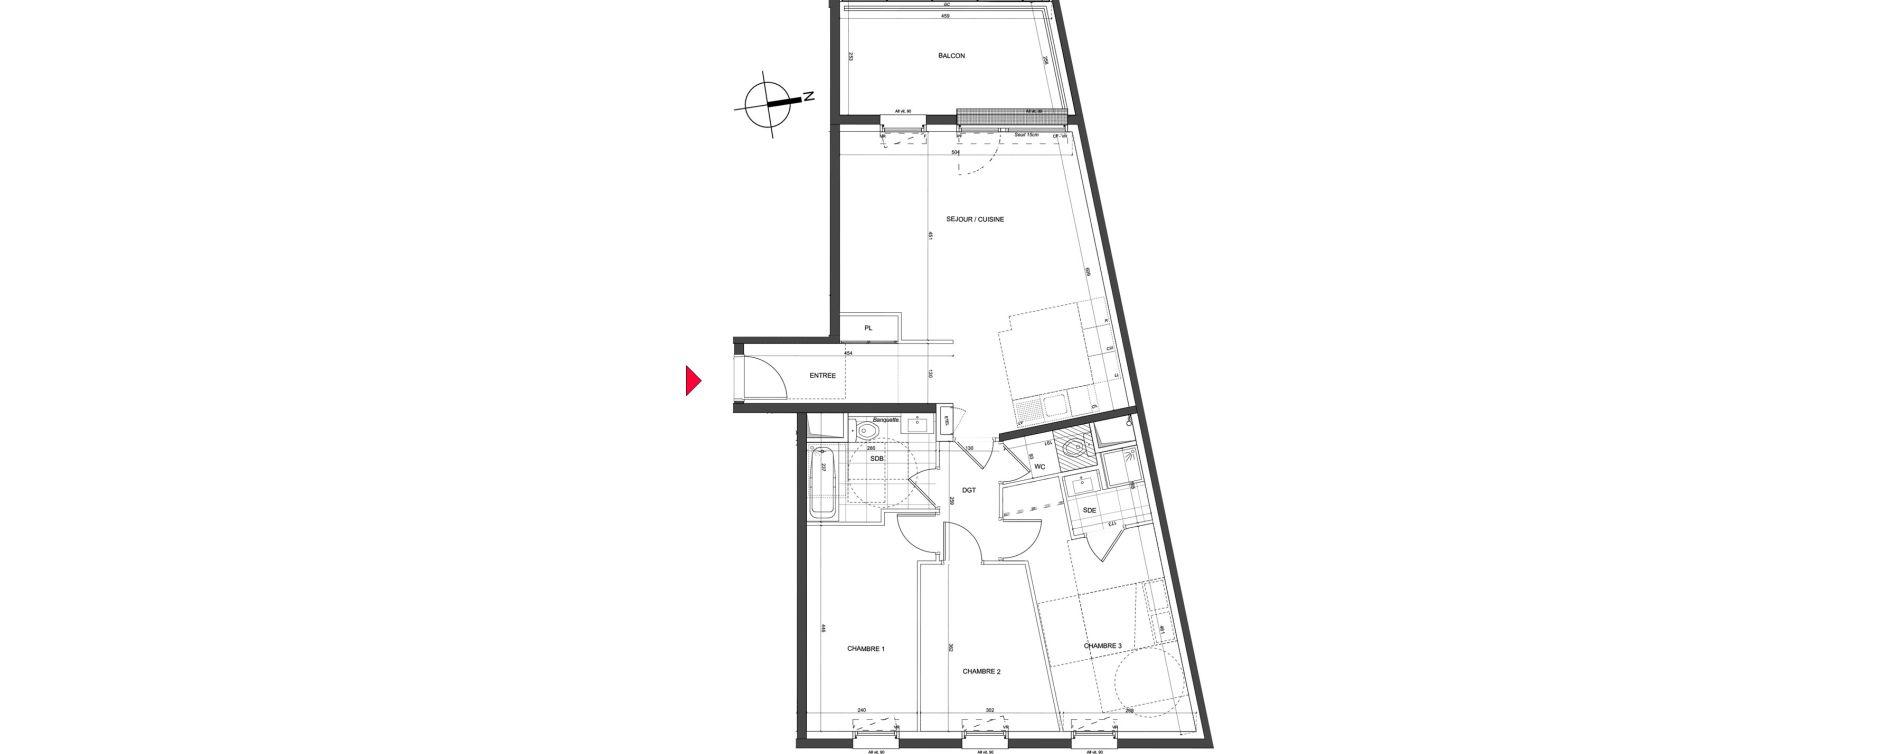 Appartement T5 de 85,82 m2 à Nancy Charles iii